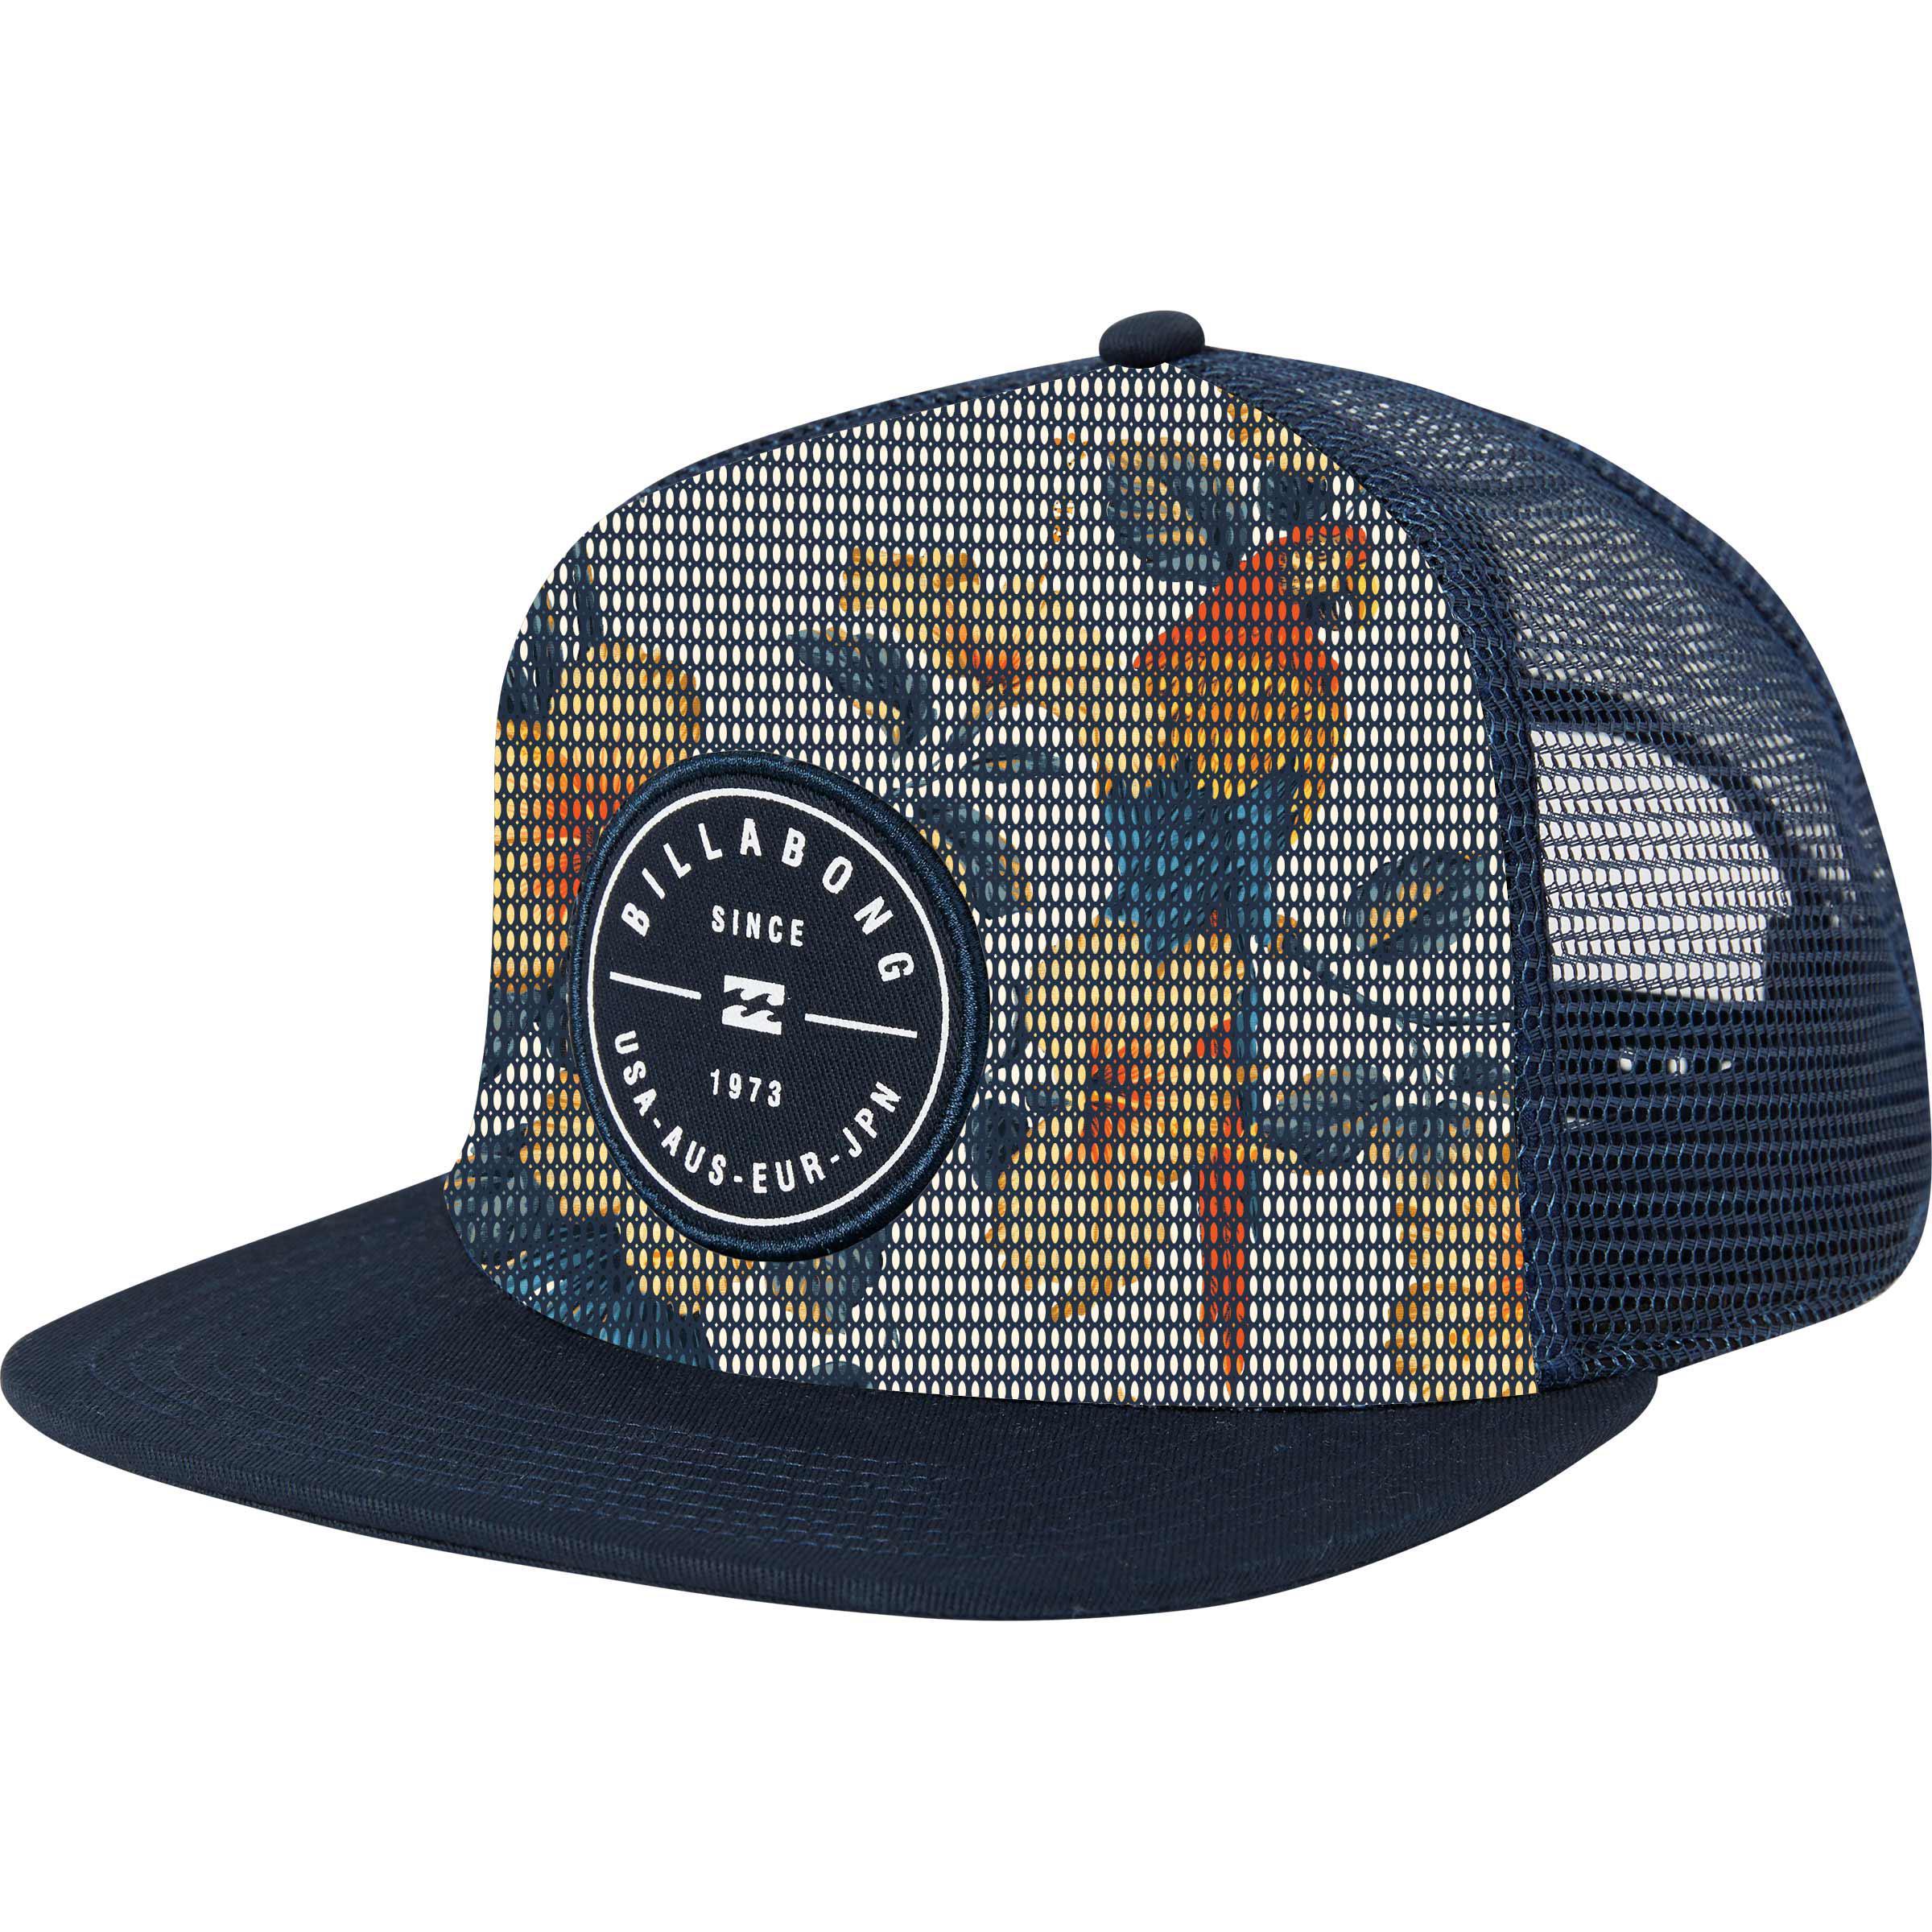 7fa68bc87f549 Billabong Rotor Trucker Hat in Blue for Men - Lyst